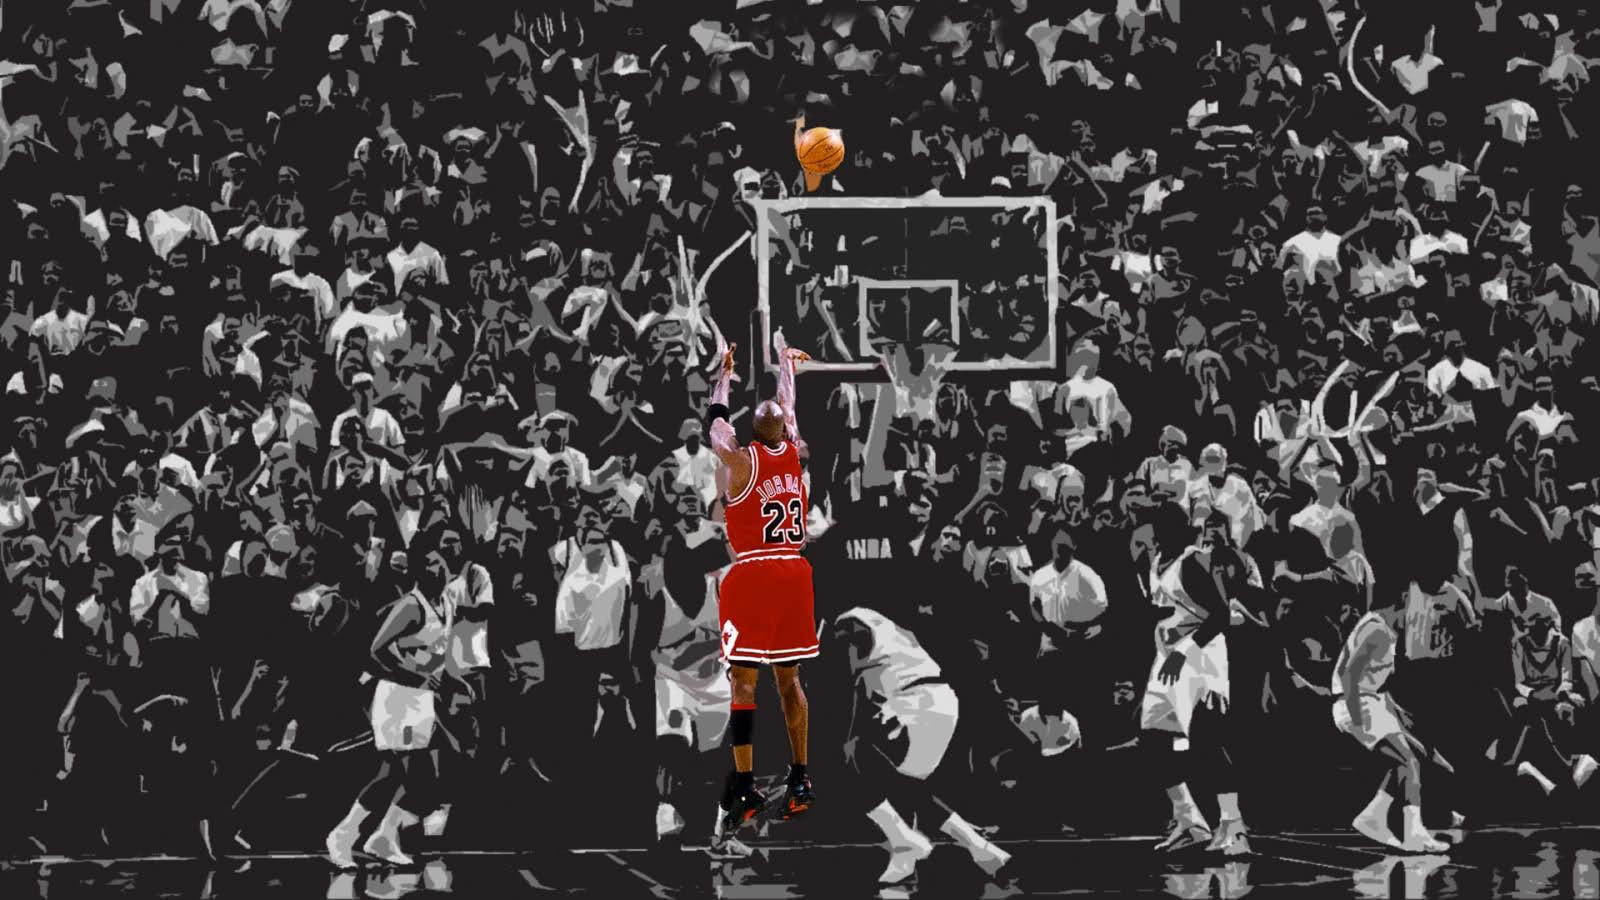 Michael Jordan Hd Wallpaper 22544 Wallpapers HD colourinwallpaper 1600x900